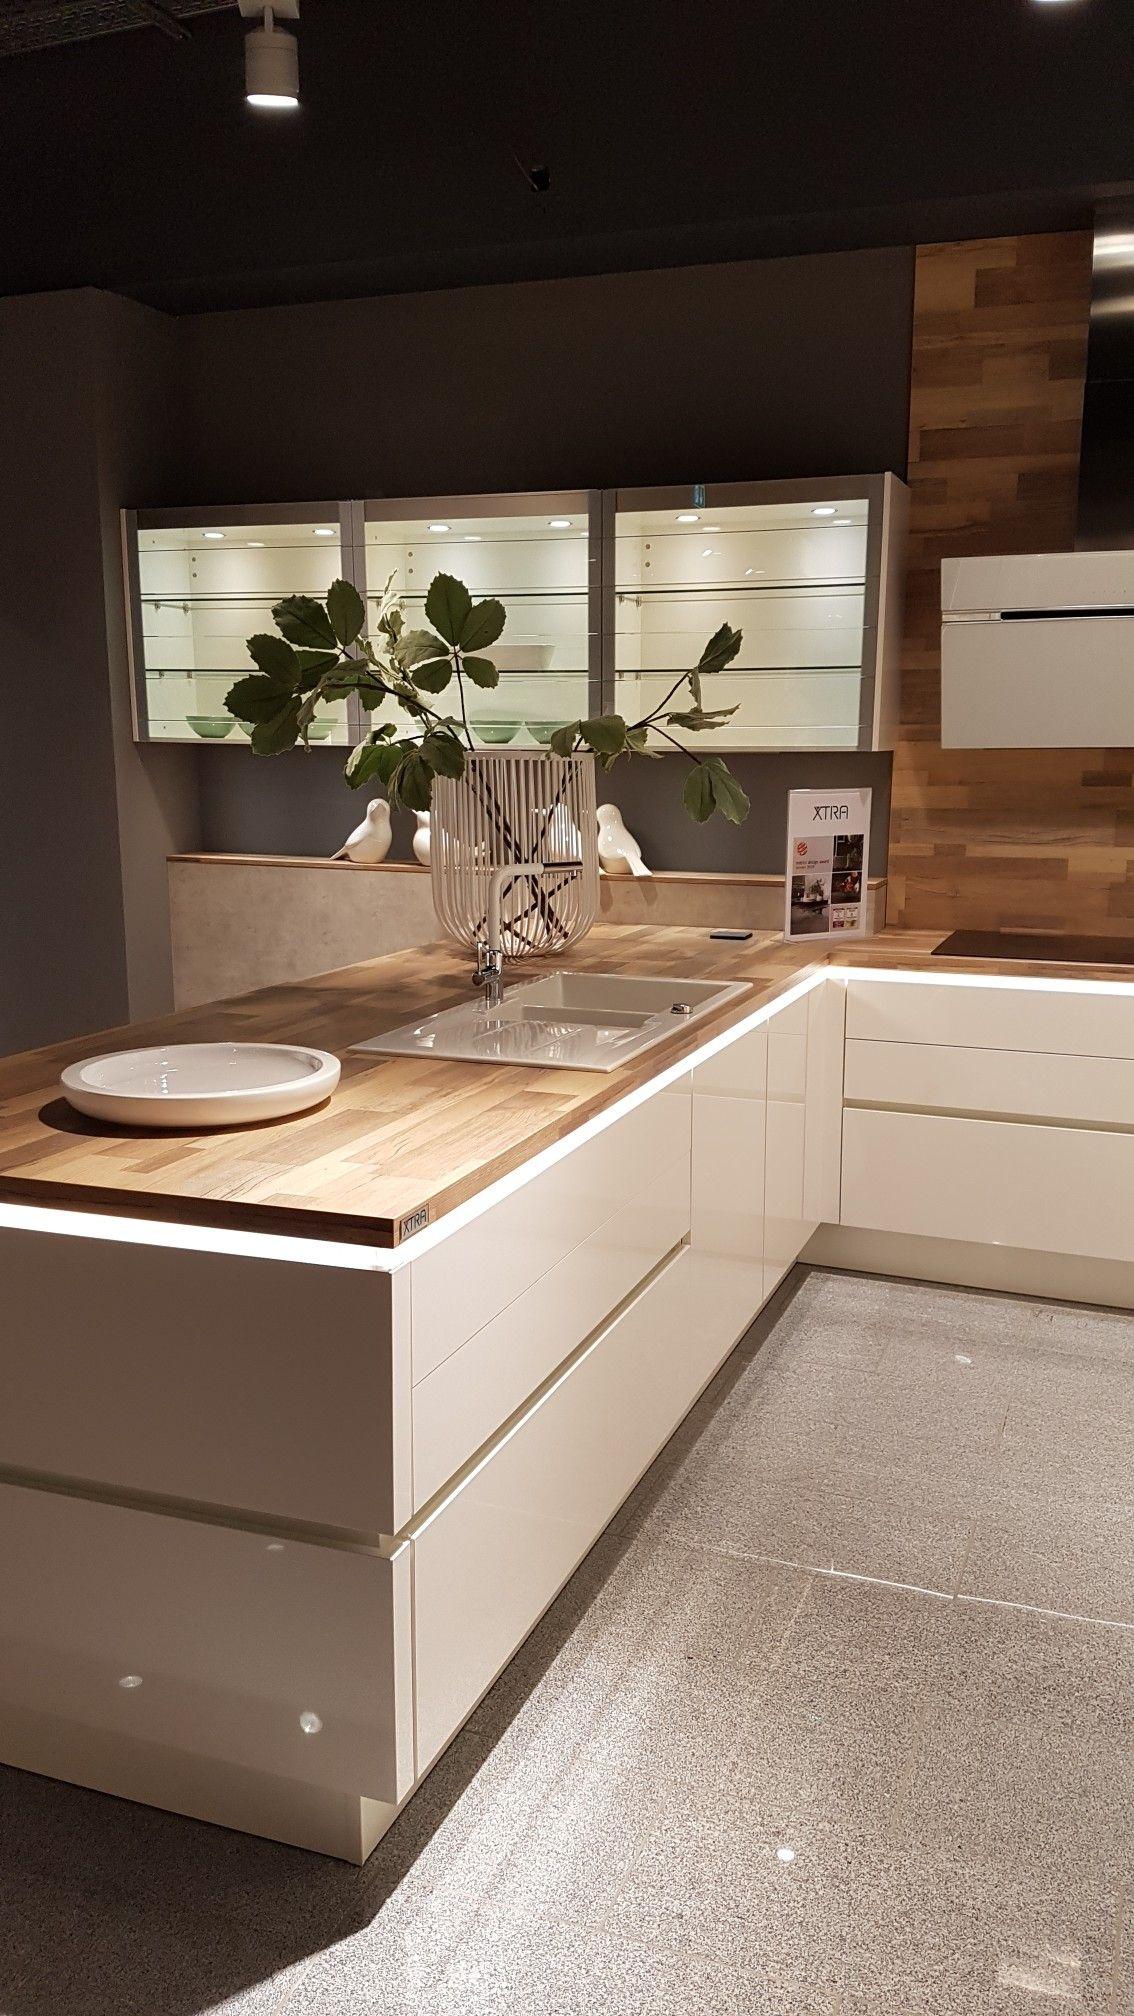 Pin di Amy Vaquero su Küchen Ideen  Arredo interni cucina, Design